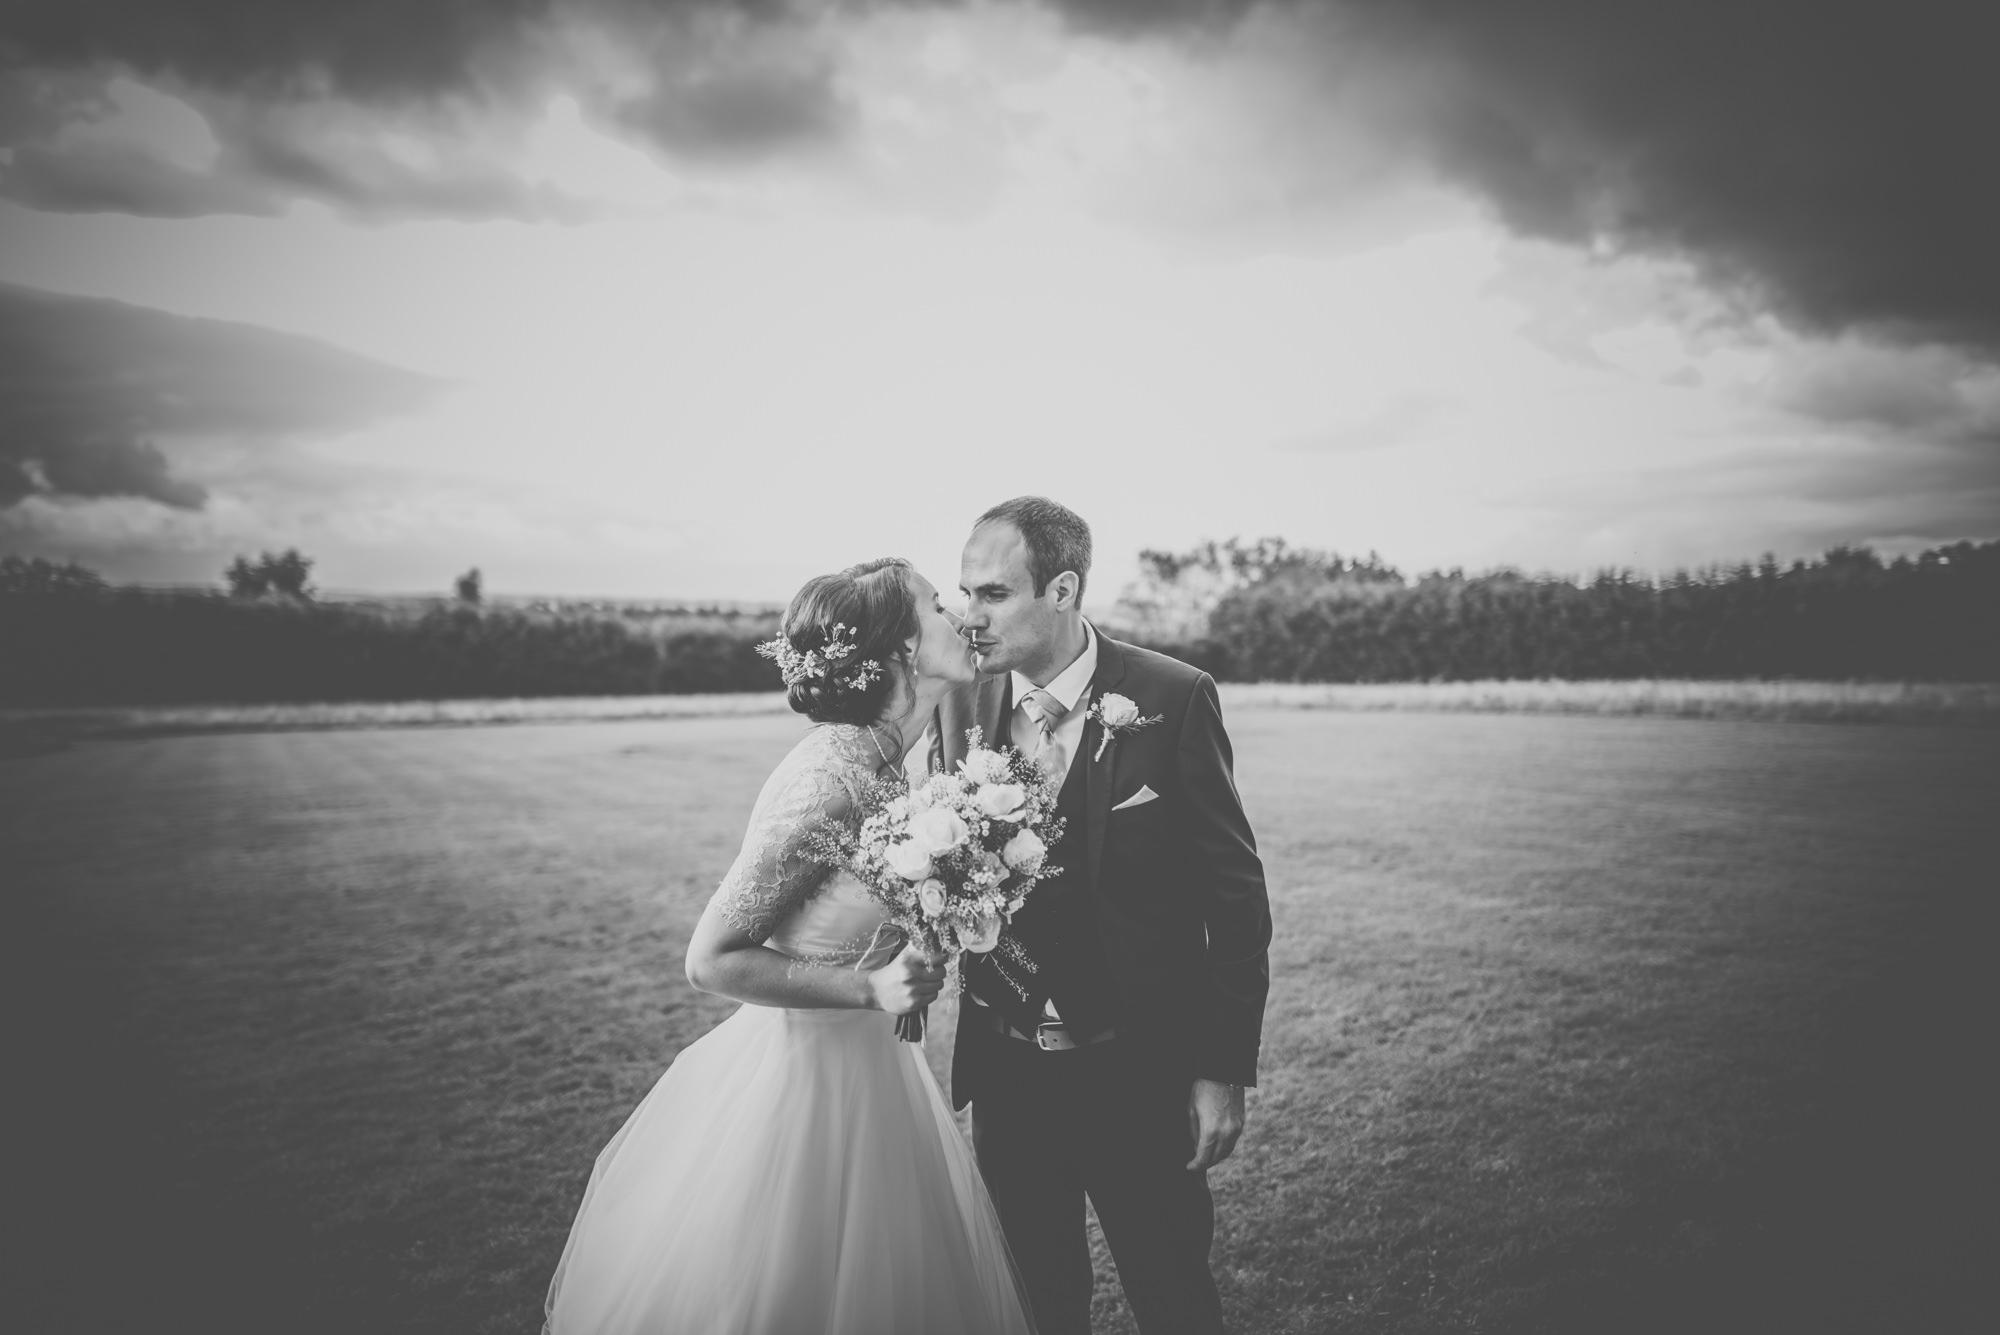 Charisse-and-James-wedding-in-Cain-Manor-Venue-Hampshire-Manu-Mendoza-Wedding-Photography-376.jpg